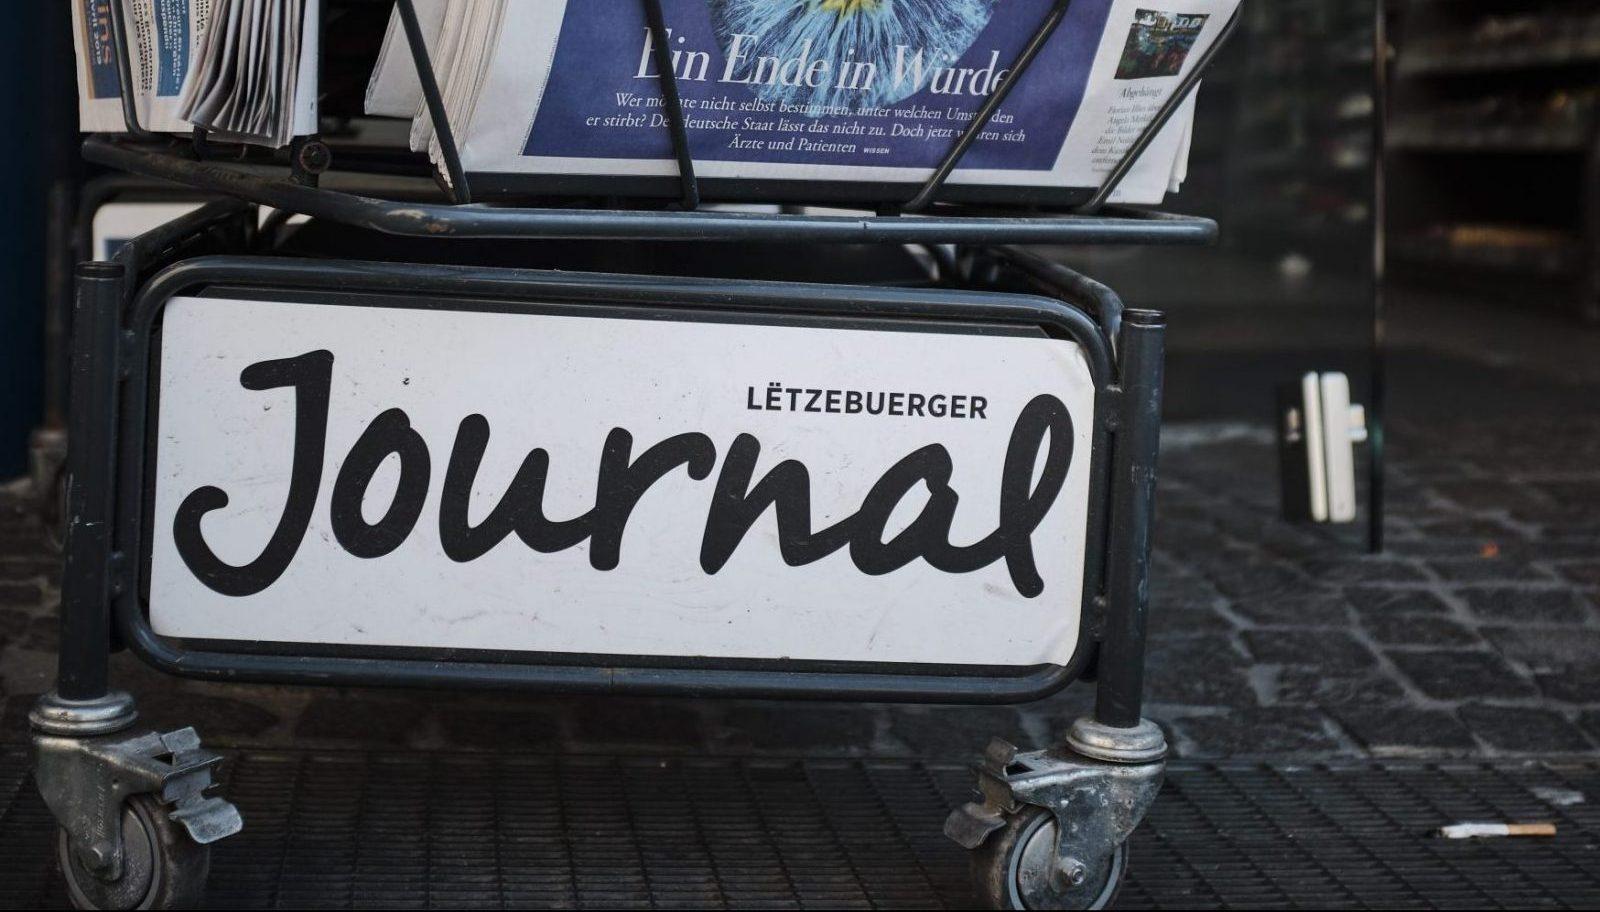 Lëtzebuerger Journal: Digitaler Befreiungsschlag in der Krise - Reporter.lu